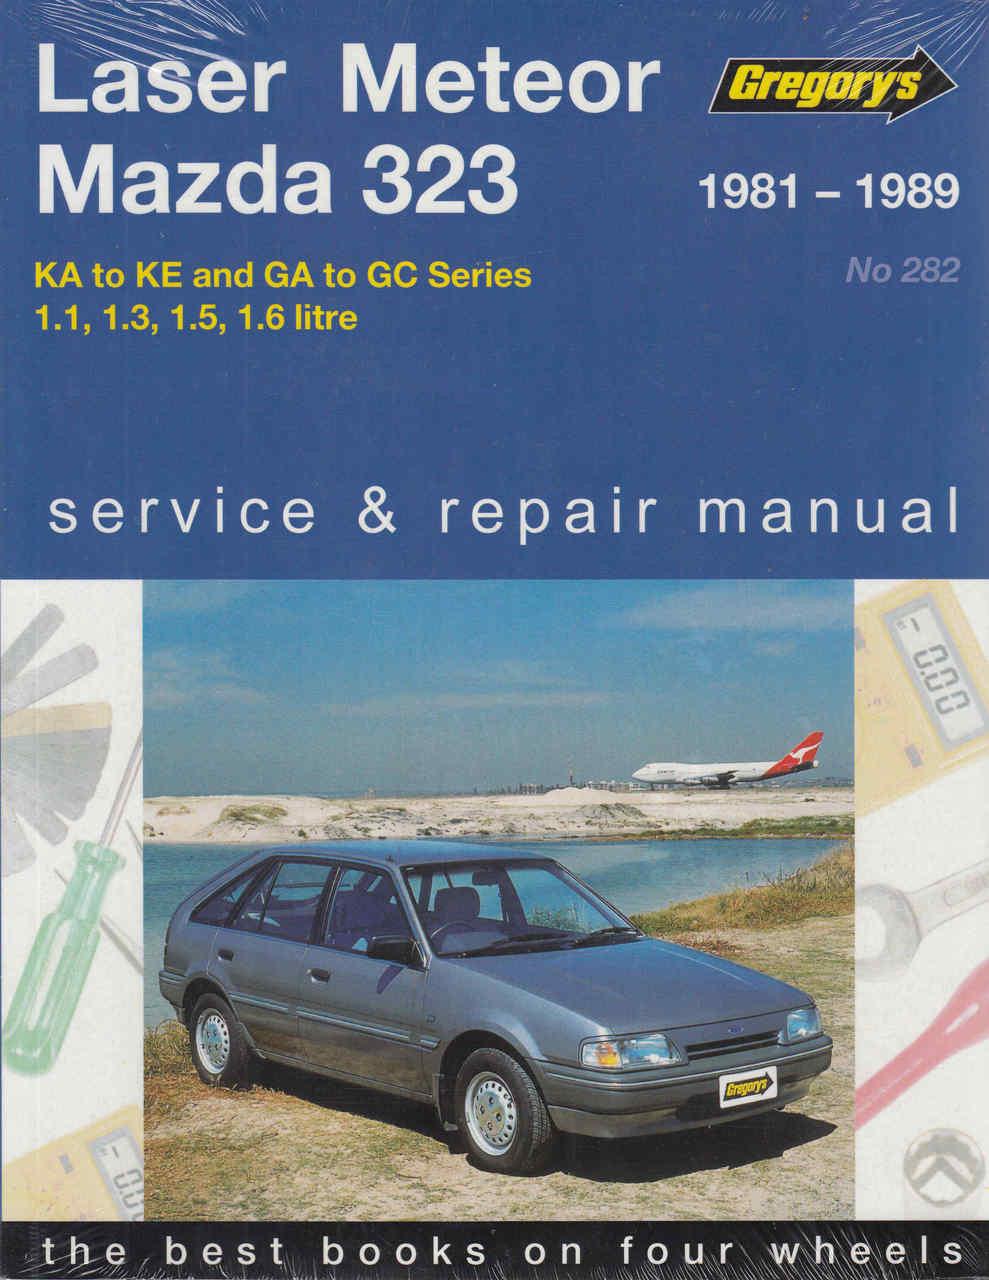 Ford Laser, Ford Meteor and Mazda 323 KA to KE / GA to GC Series ...